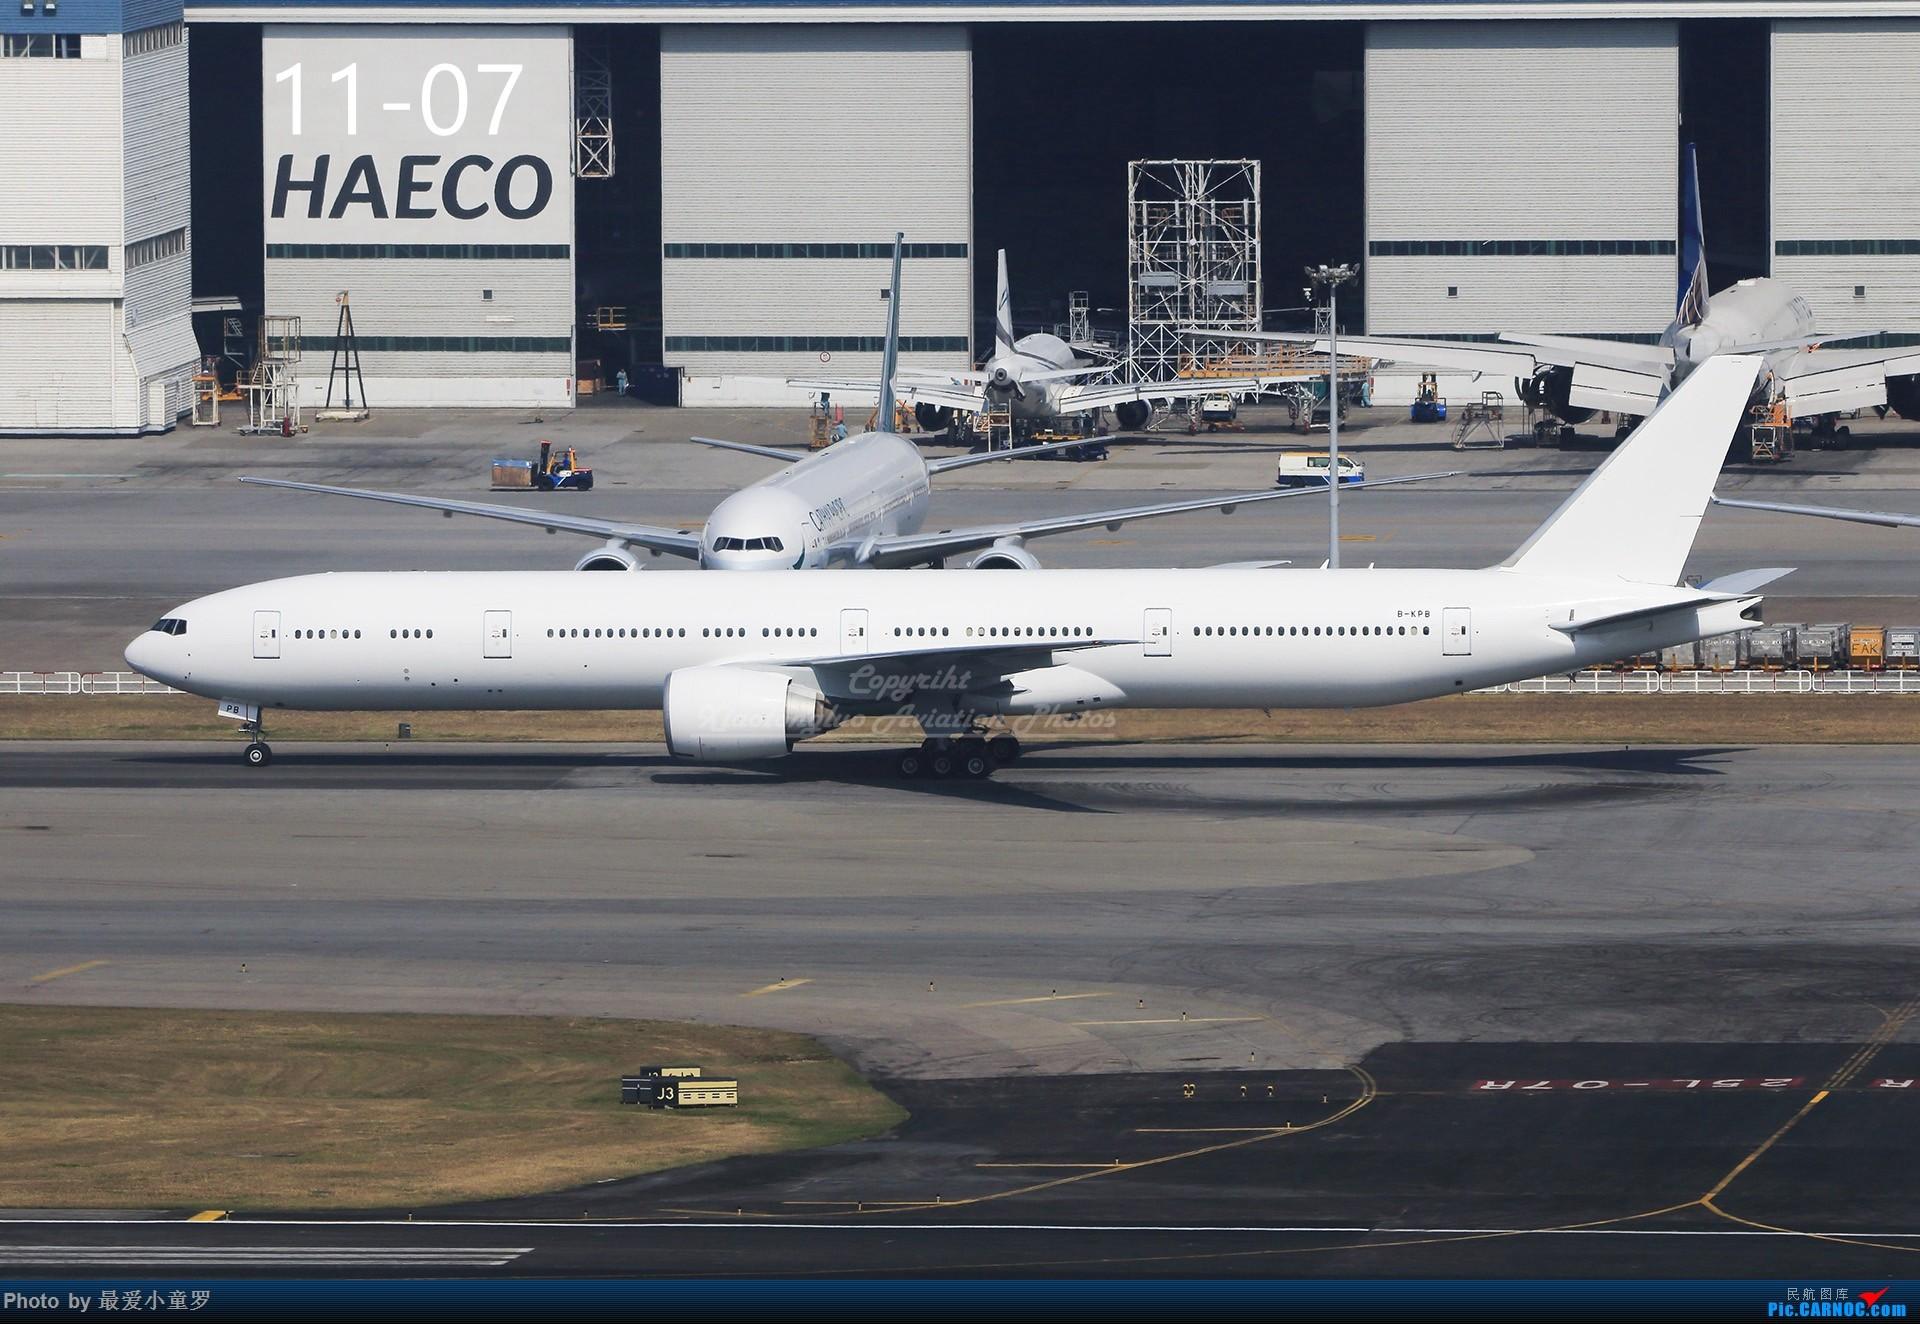 Re:[原创]年底交作业——小童罗的2018年拍机总结 BOEING 777-300ER B-KPB 中国香港国际机场